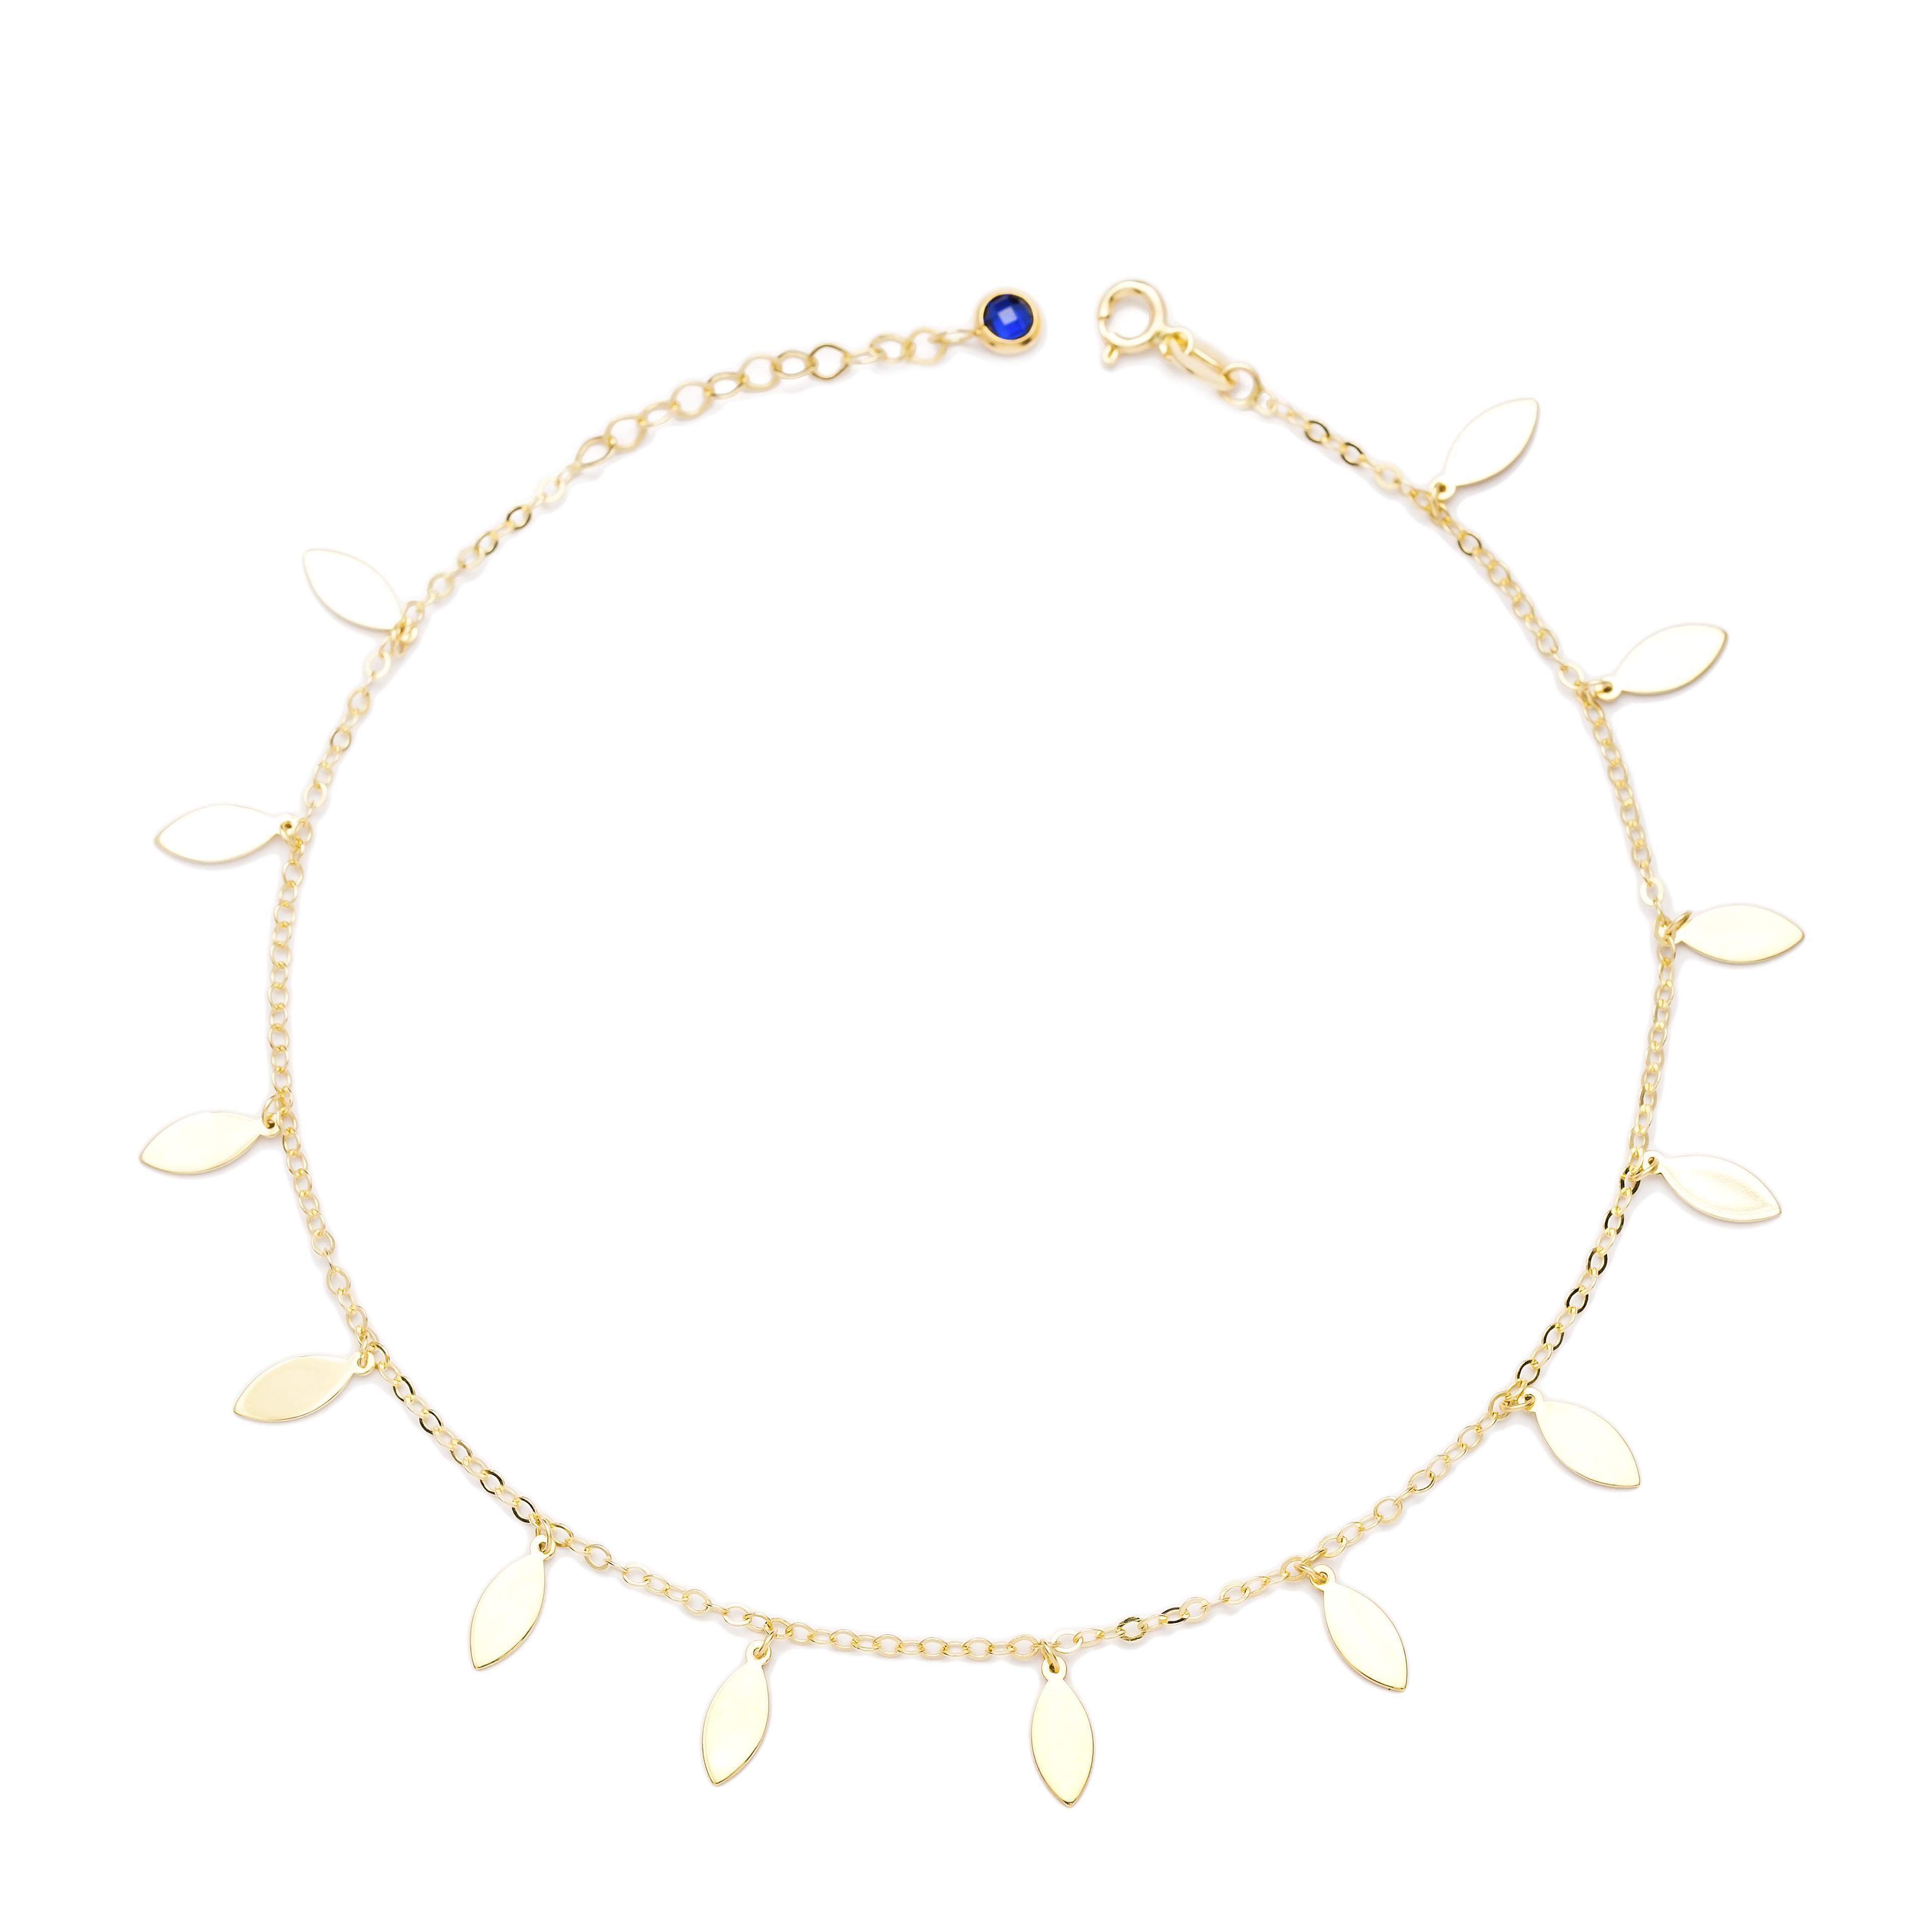 Shaker Almond Shape 10k Gold Anklet Turkish Wholesale Gold Jewelry